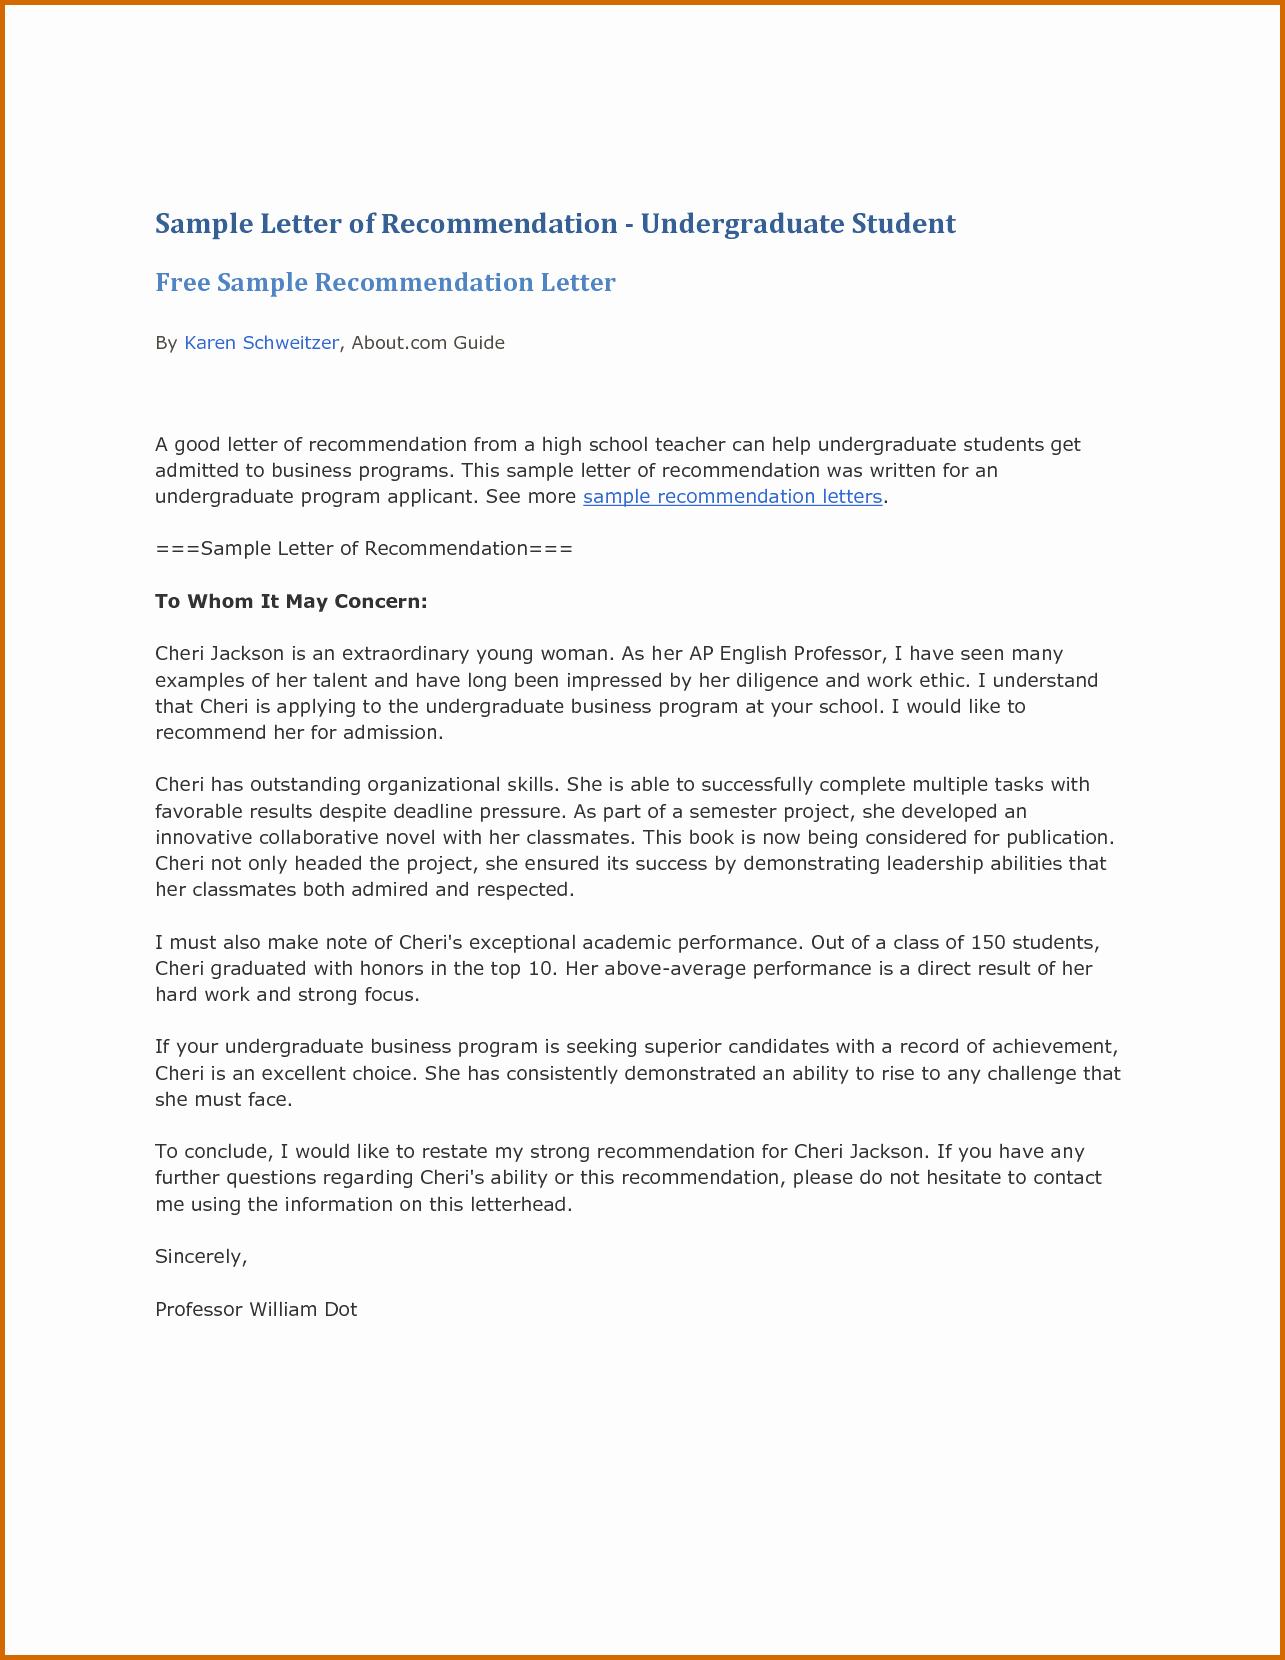 Teacher Letter Of Recommendation Template Luxury 13 Re Mendation Letter for Student Sample